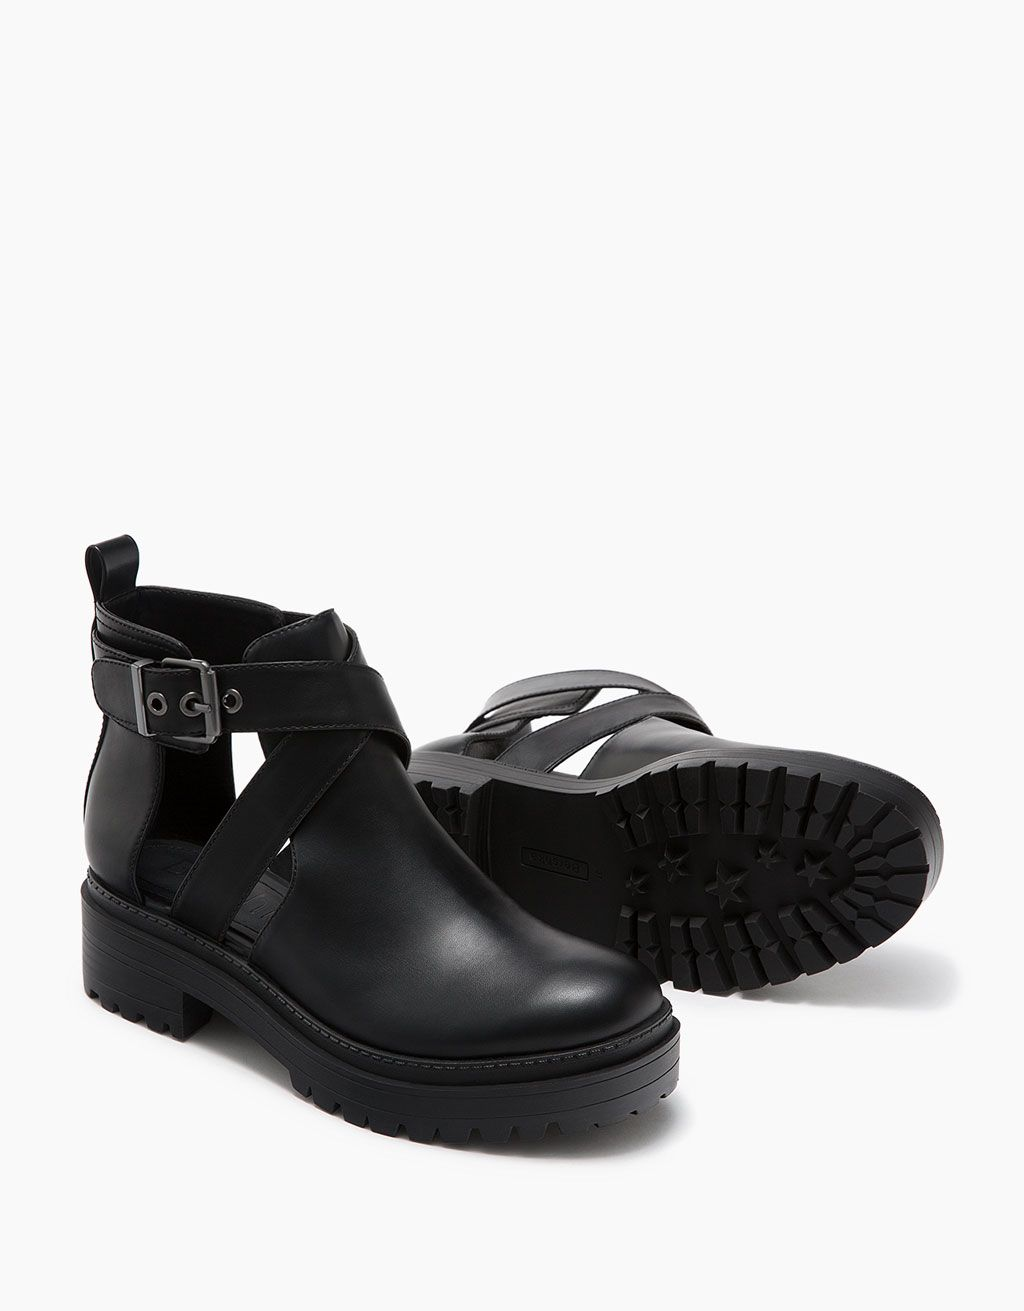 bottines plates fentes et boucle - chaussures - bershka france